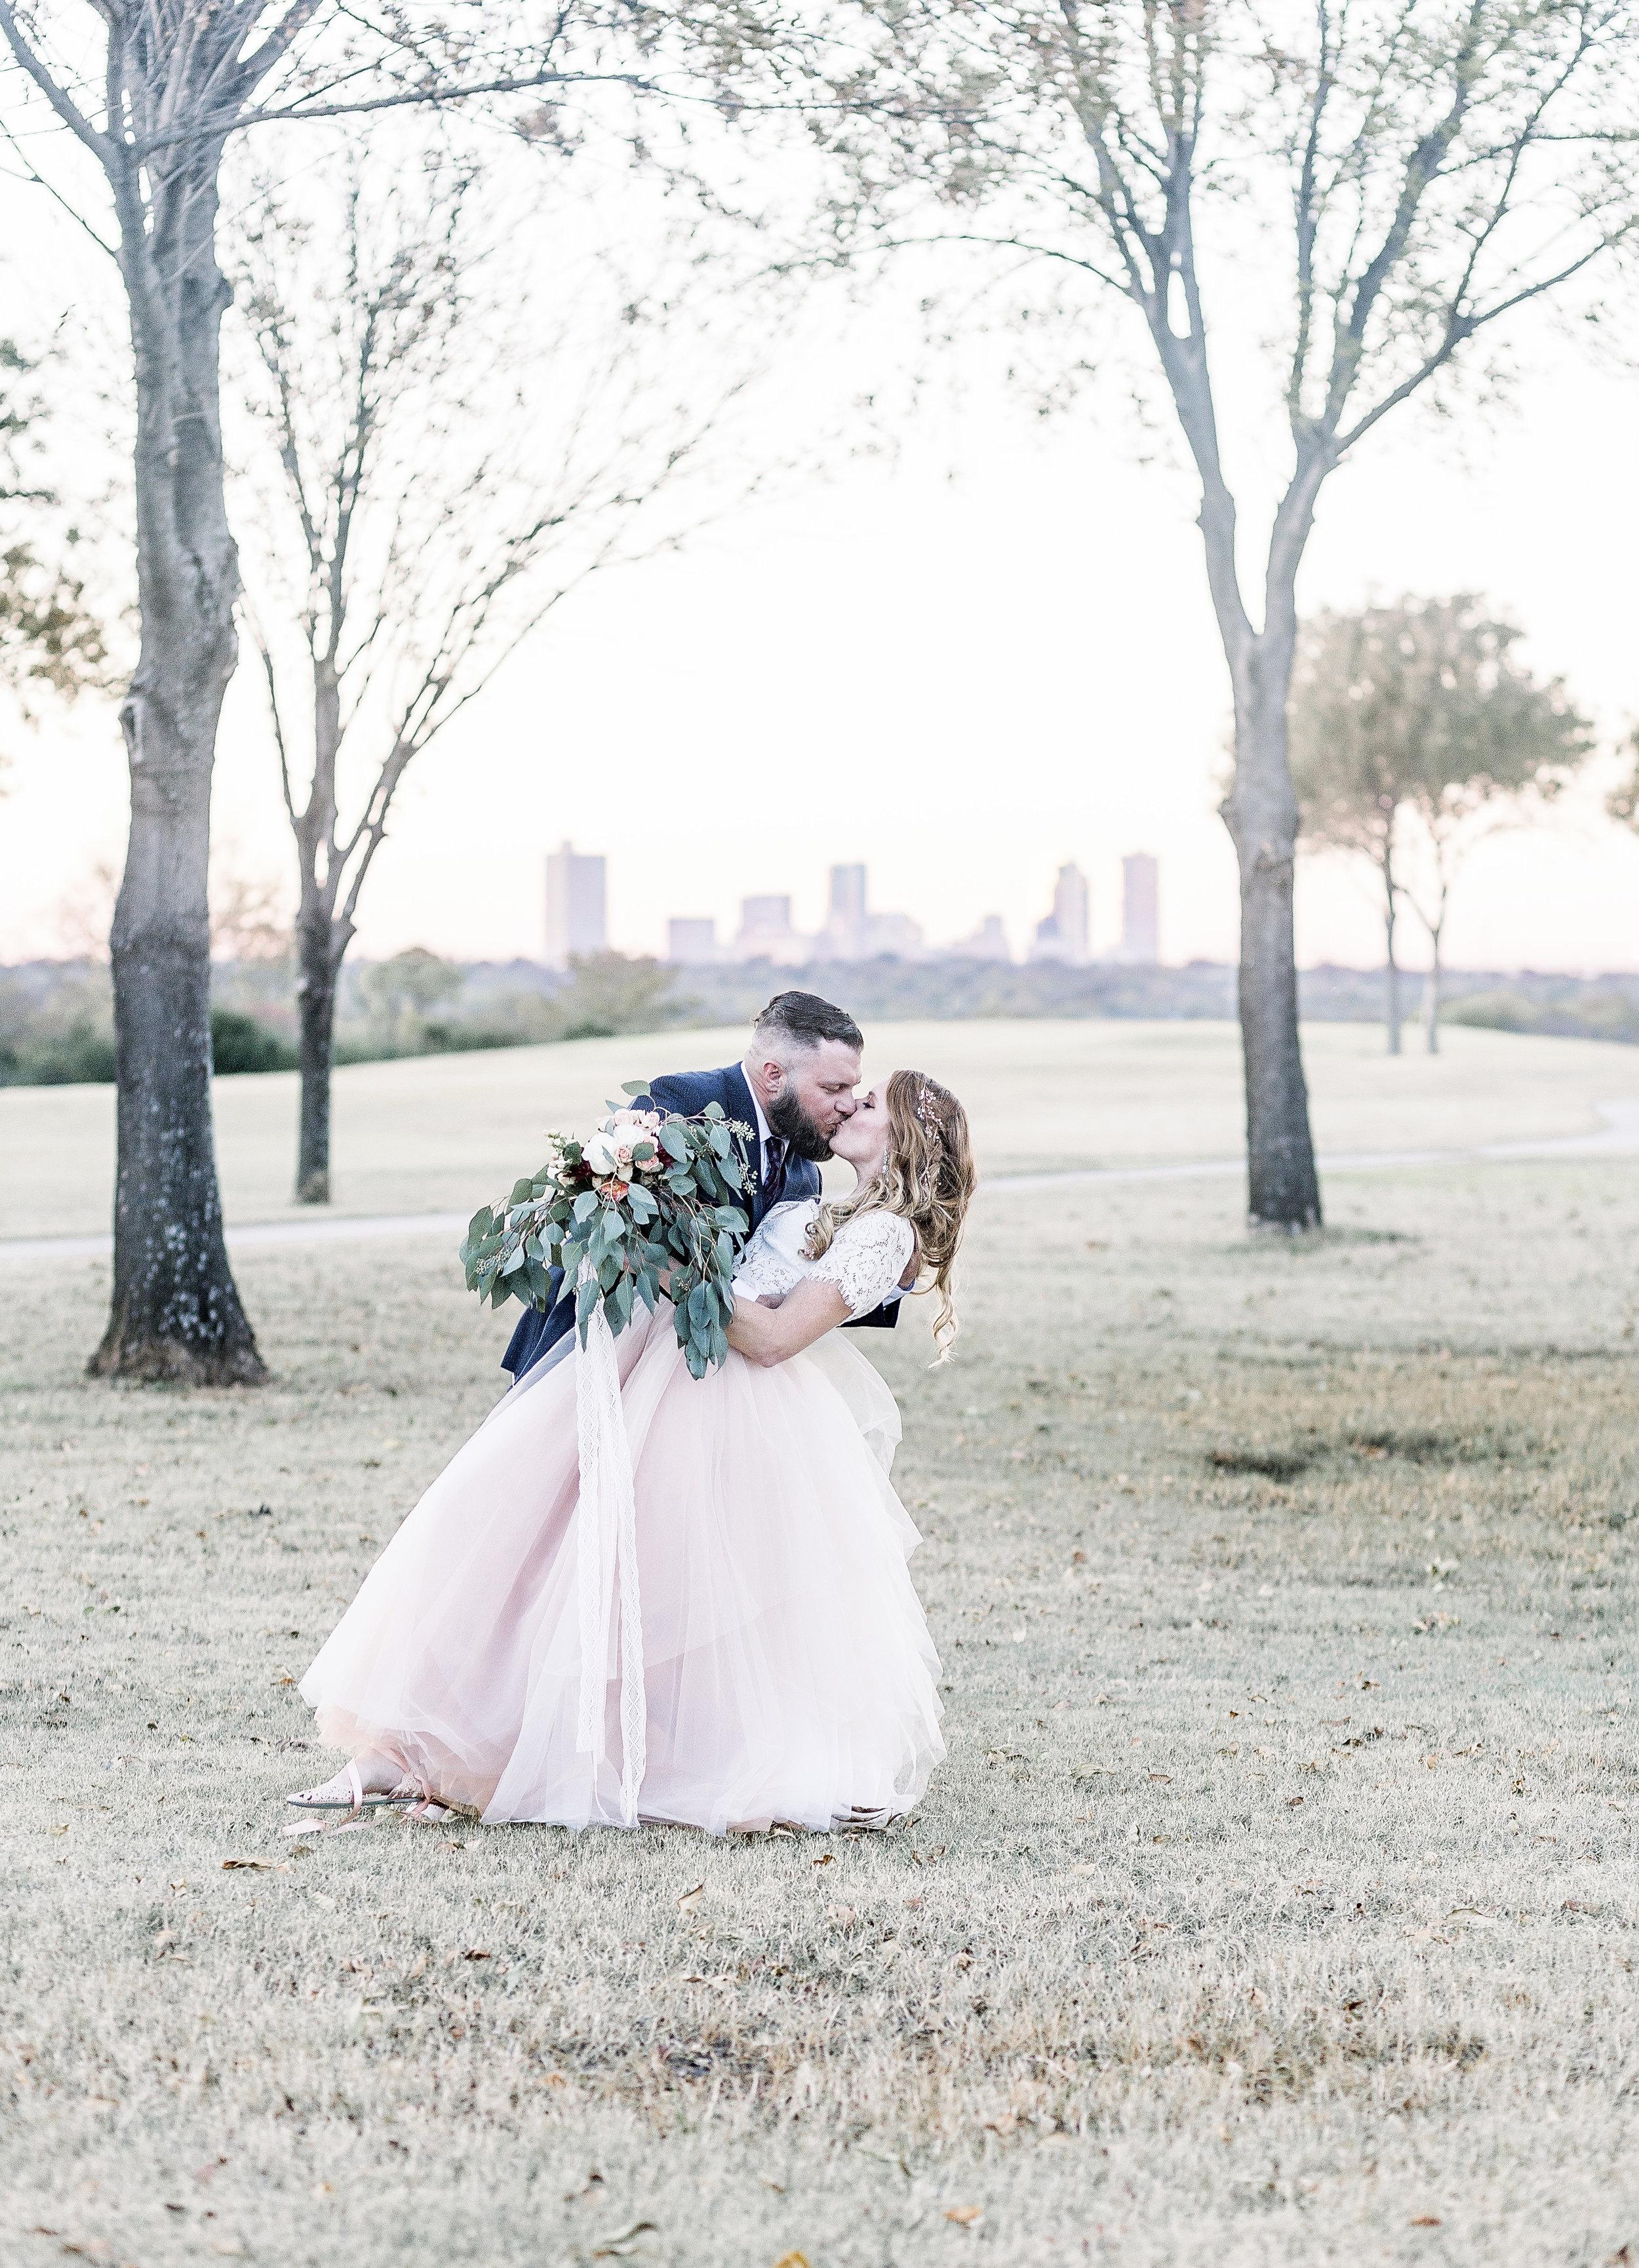 DFW Fort Worth Wedding Photographer Malia Maureen Photography Emily & Daniel.jpg